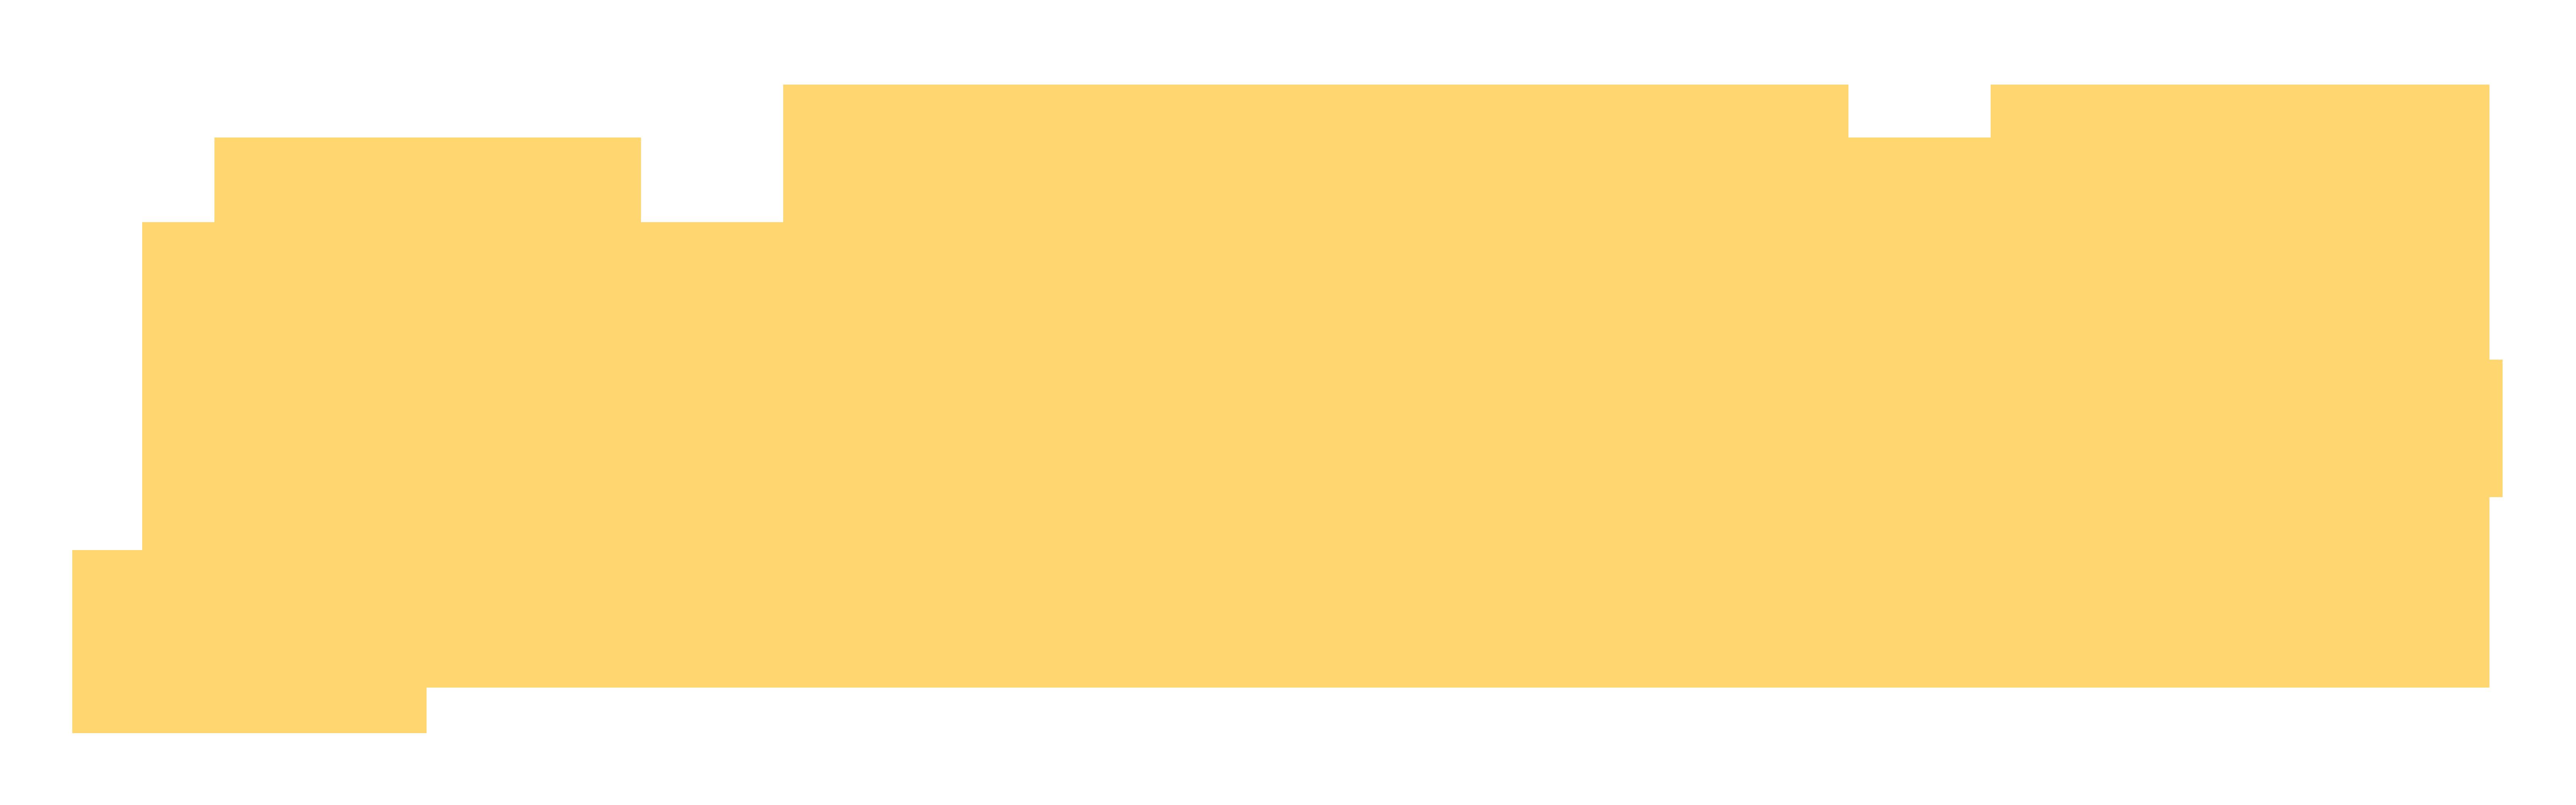 Ambler_horiz_yellow